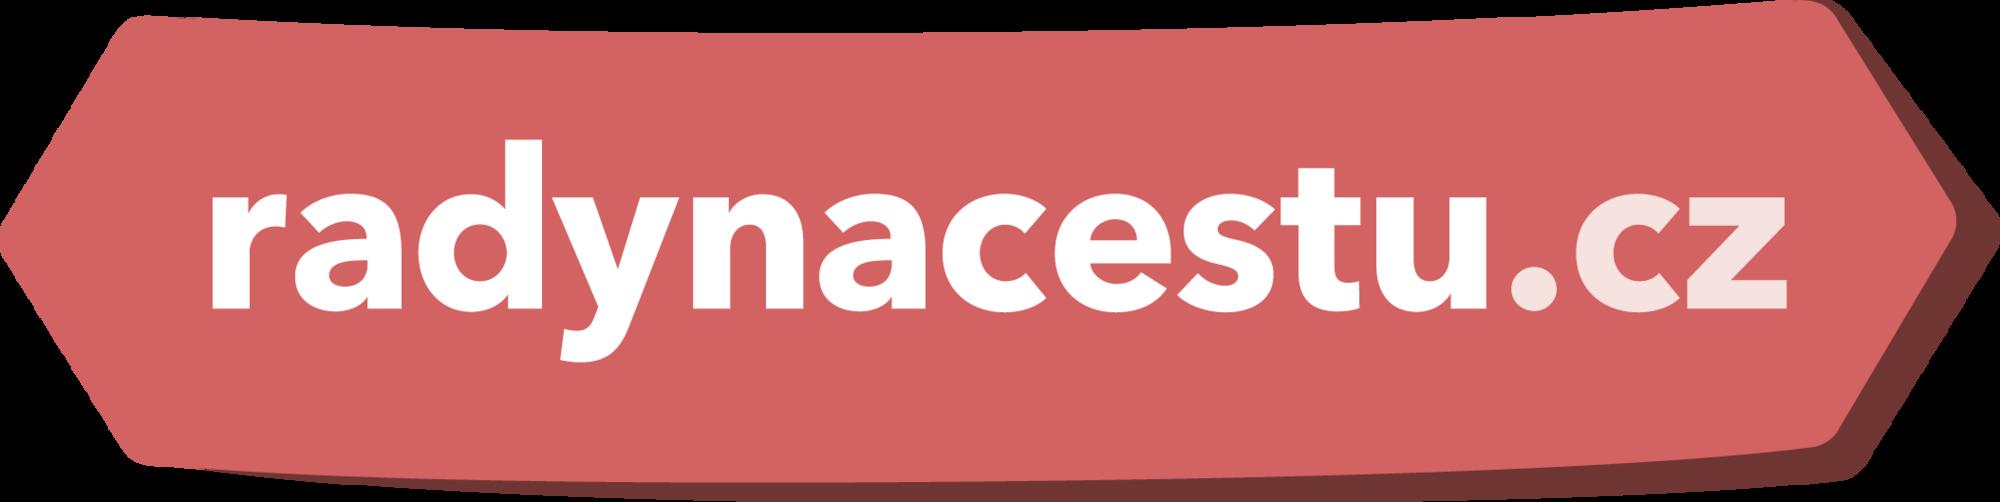 rnc_logo_color